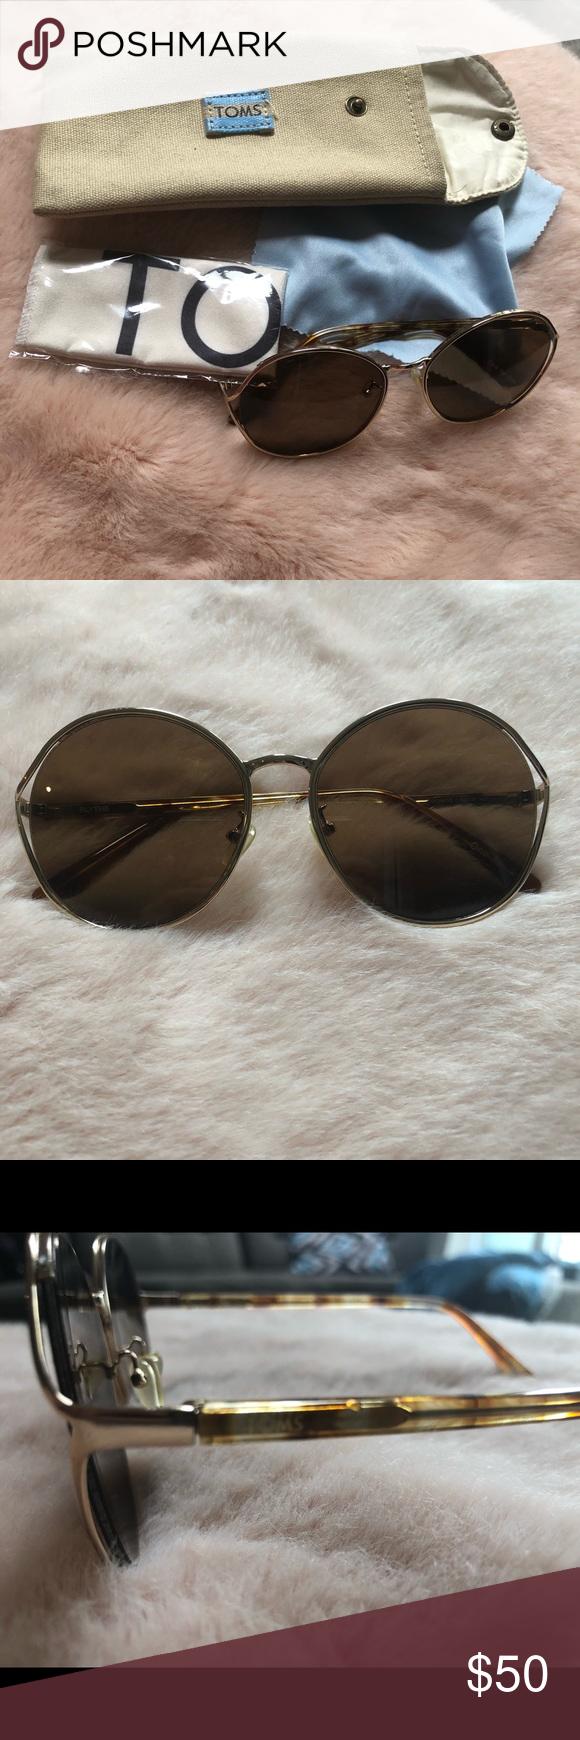 ba7f0e9575d Authentic Toms Sunglasses EUC condition